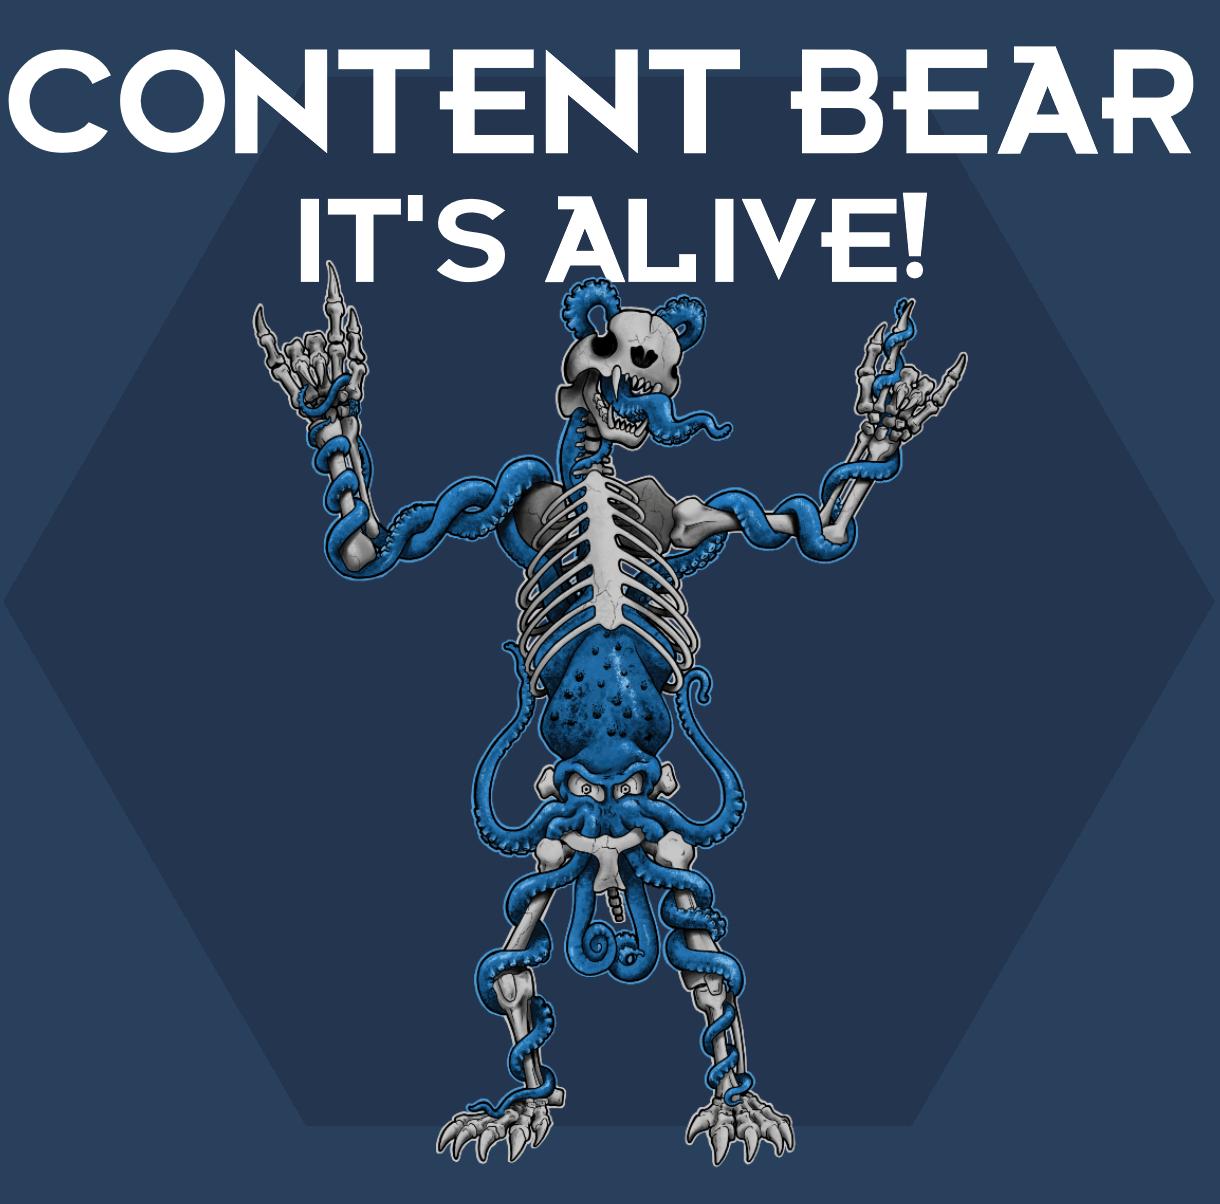 Content Bear prfam designed merch